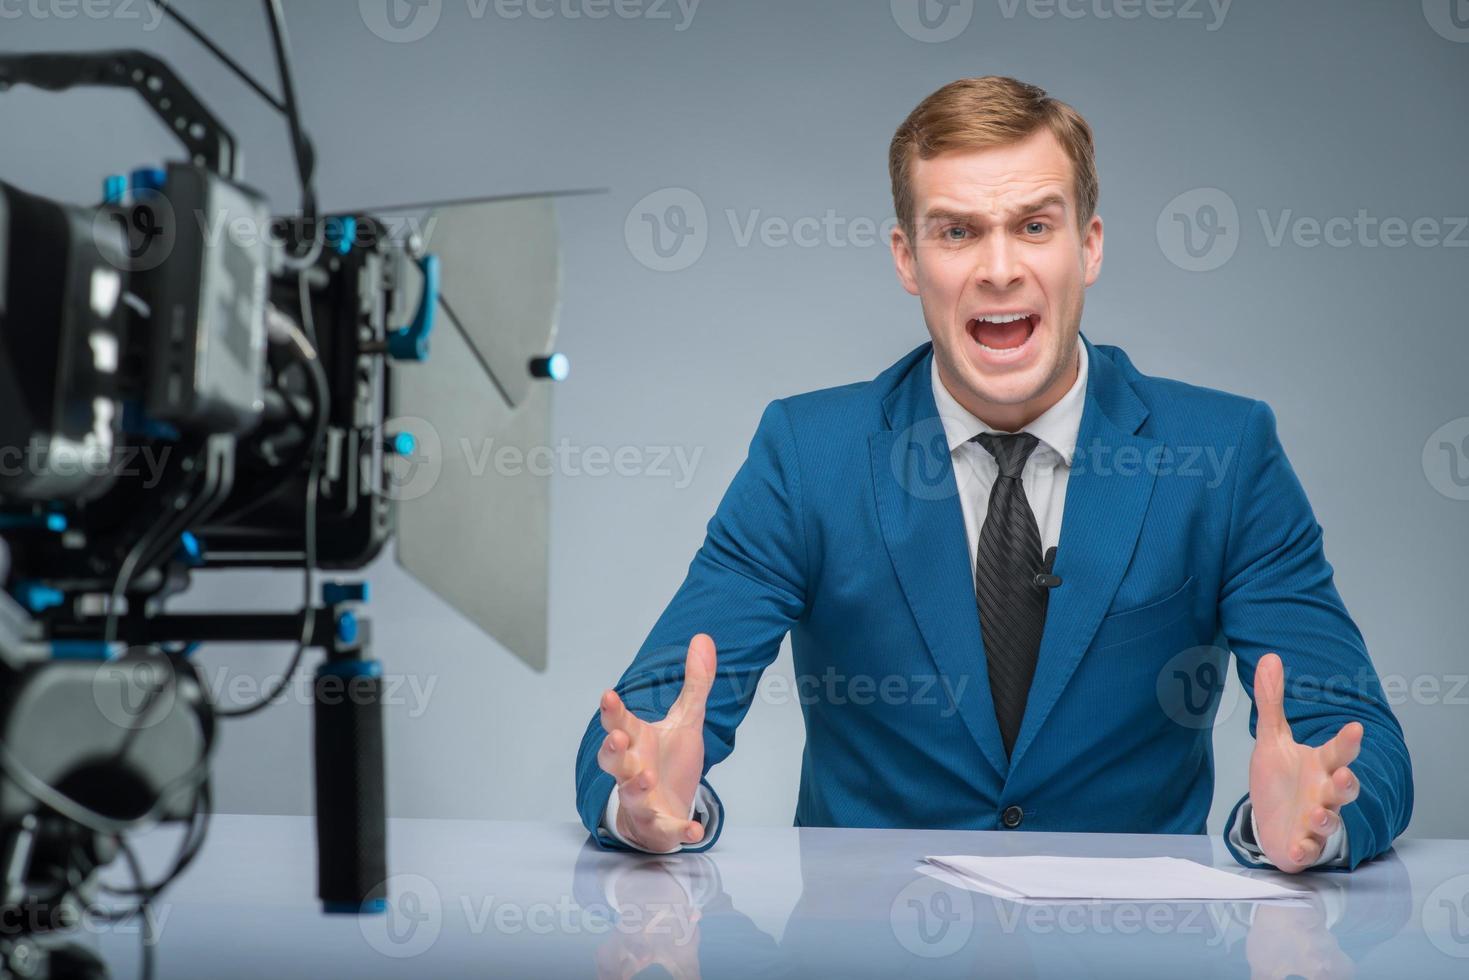 jornalista está extremamente estressado foto